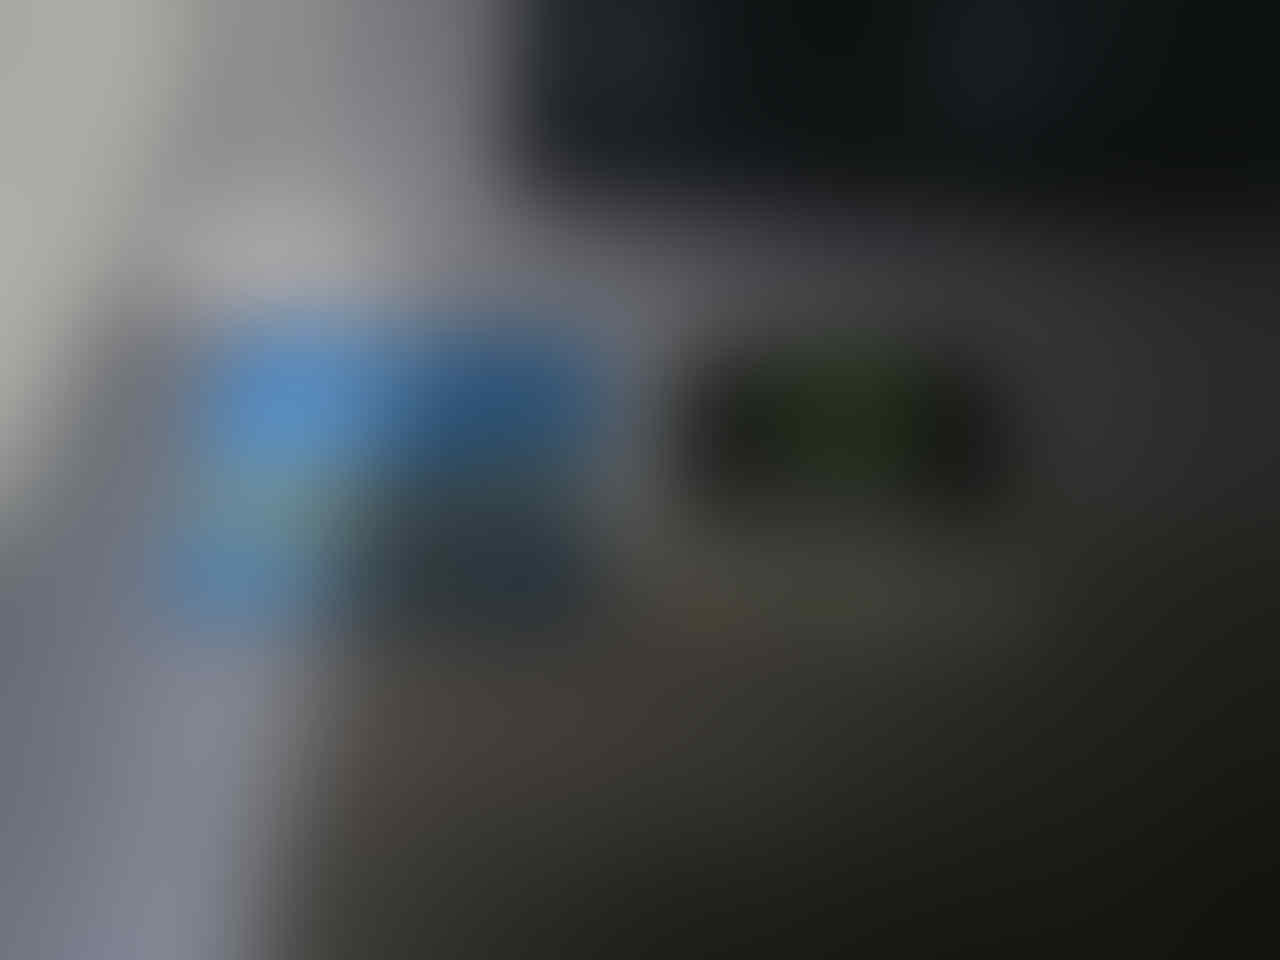 Asus A43S i3 GeForce GT540M 1GB matot mati total